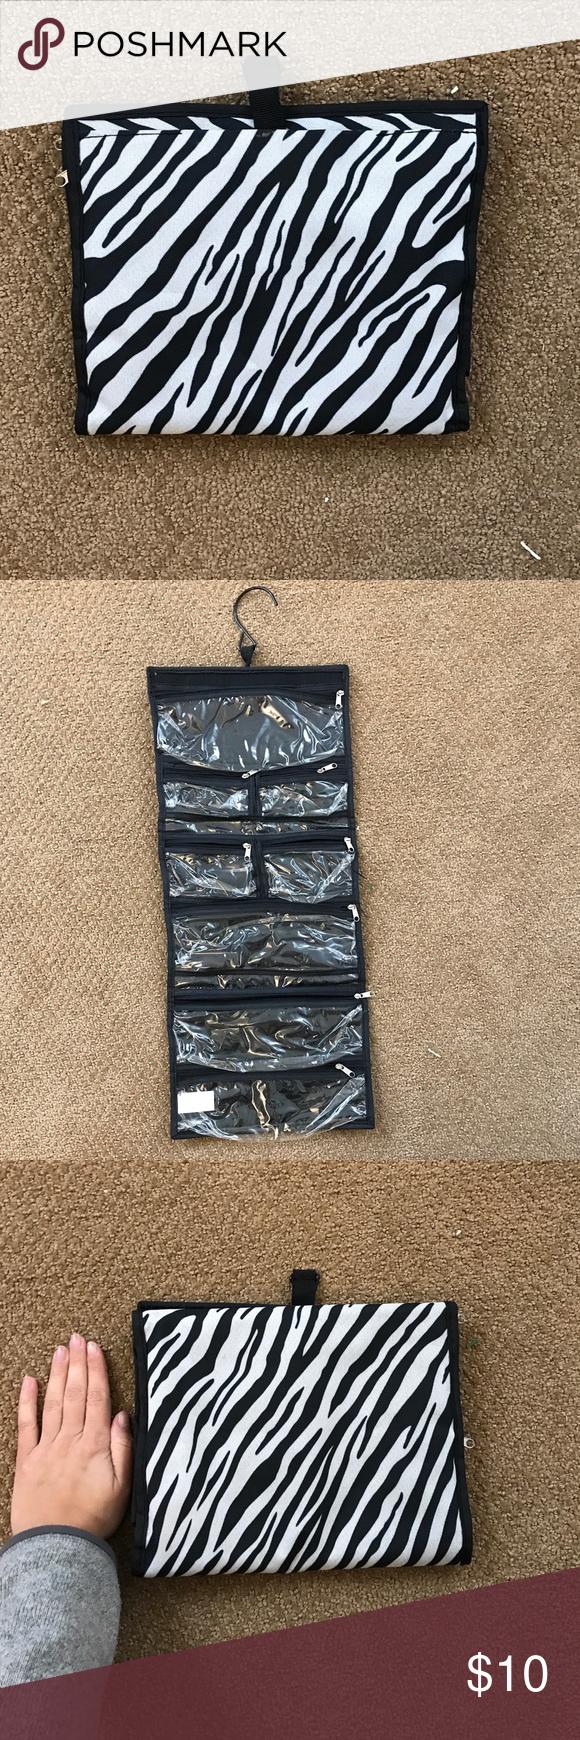 Hanging Jewelry Organizer Travel Bag